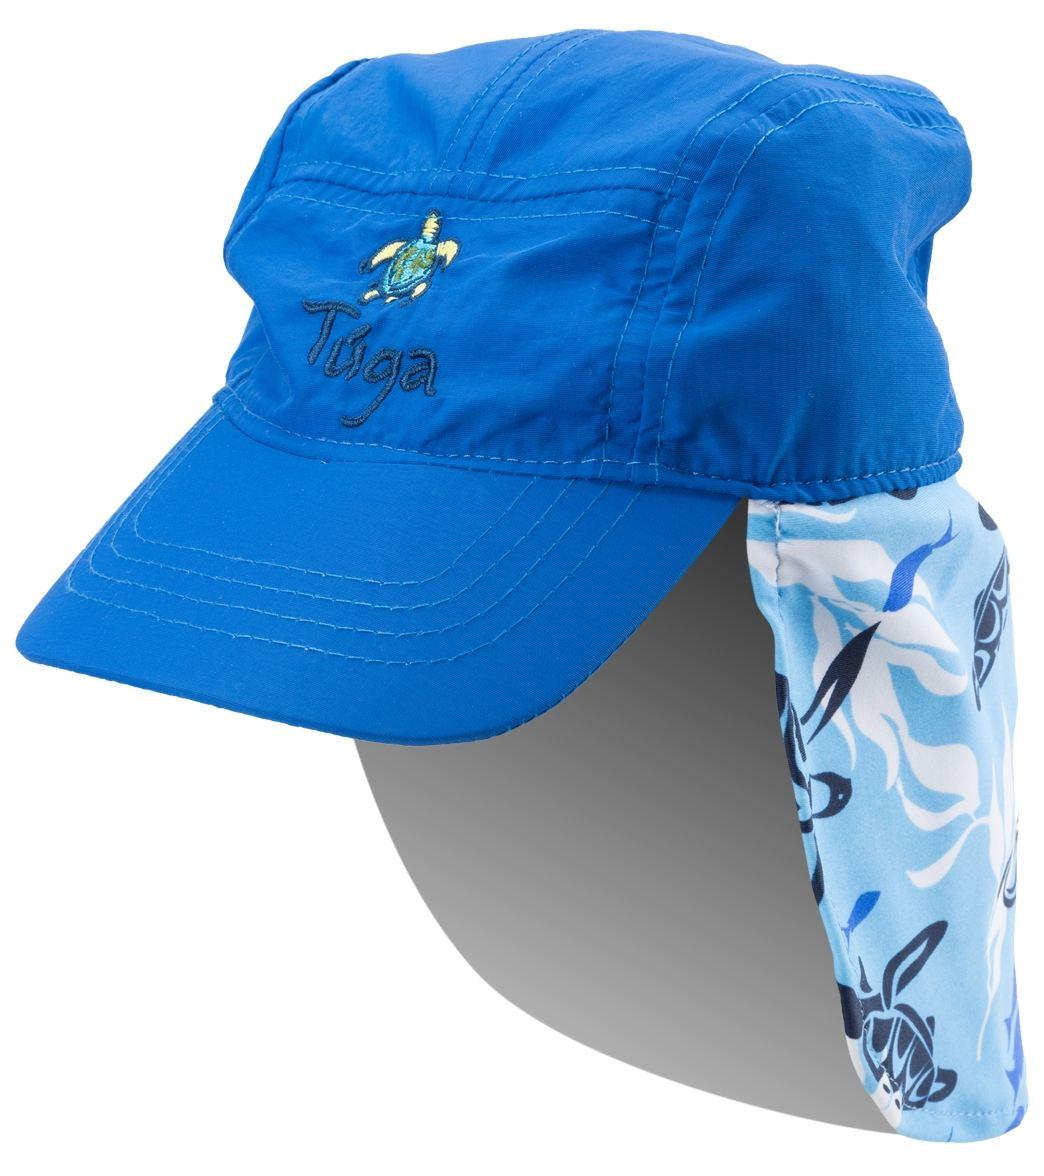 cbc2452e1e8 Tuga Boys  Turtle Paradise UPF 50+ Flap Hat at SwimOutlet.com